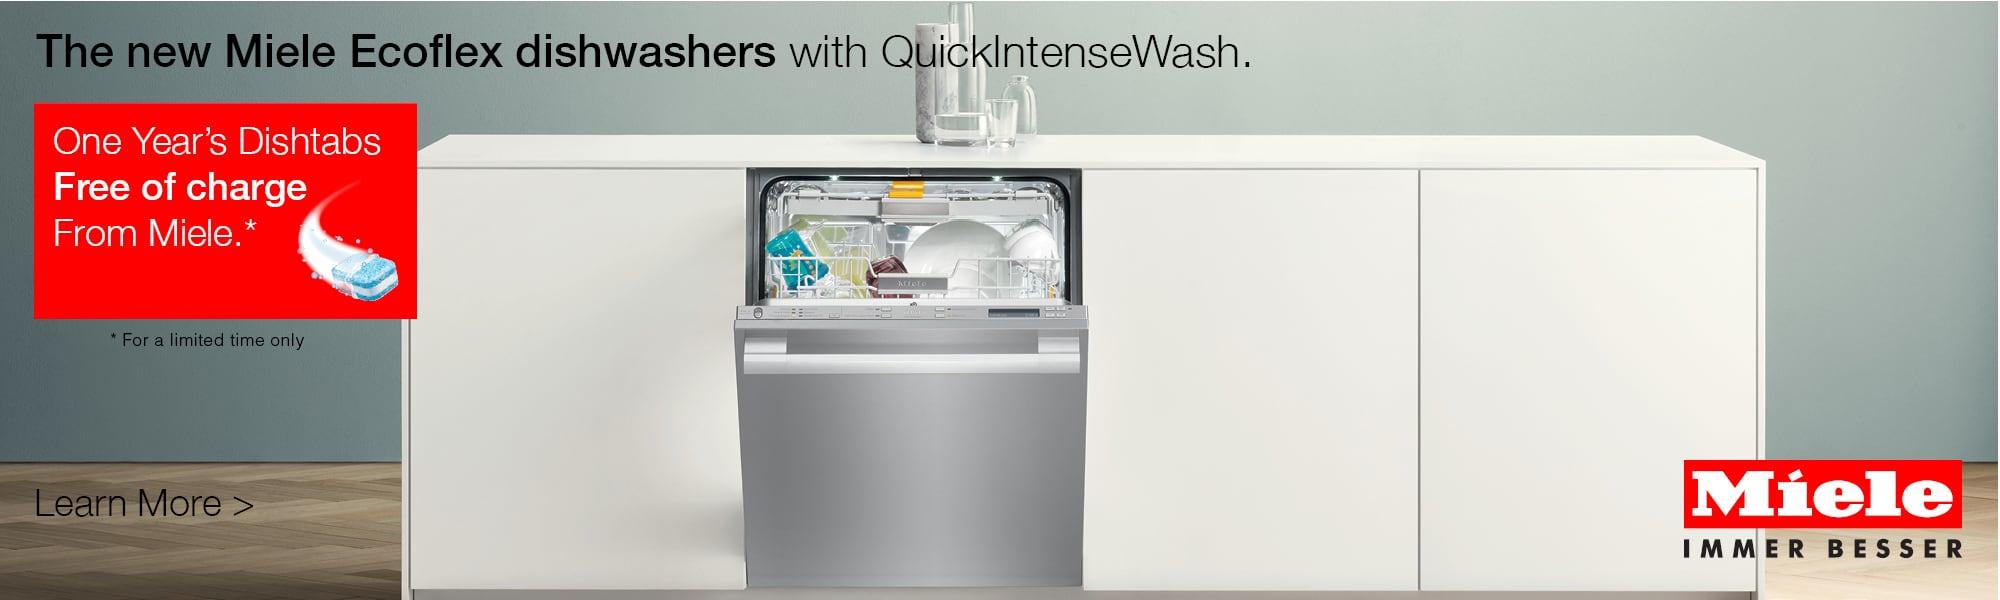 Miele Ecoflex Dishwasher